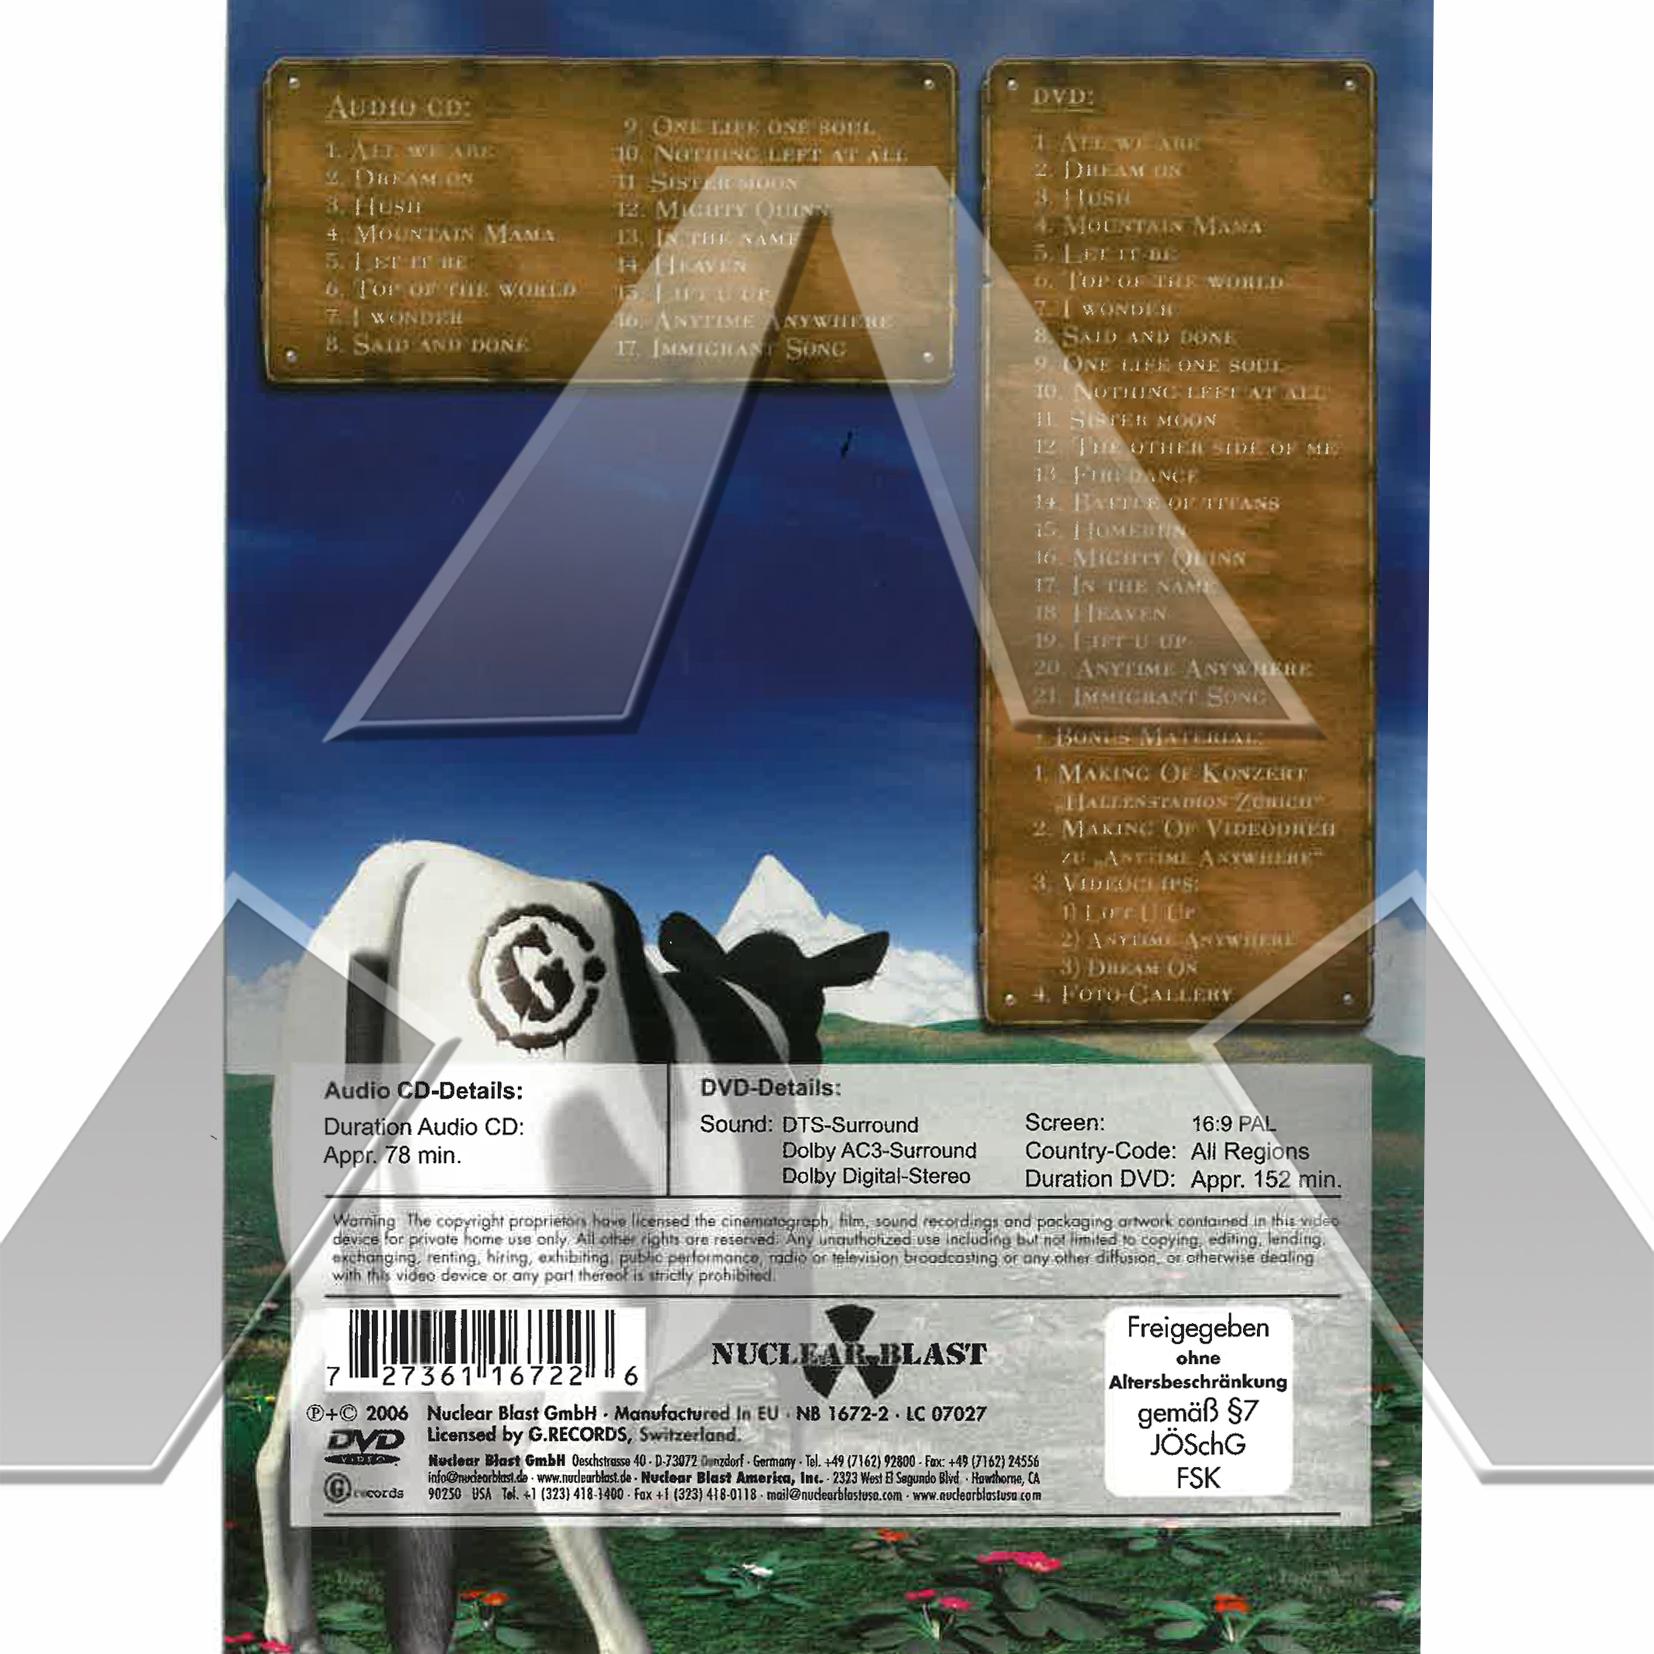 Gotthard ★ Made in Switzerland (cd album & dvd EU 2736116722 signed)